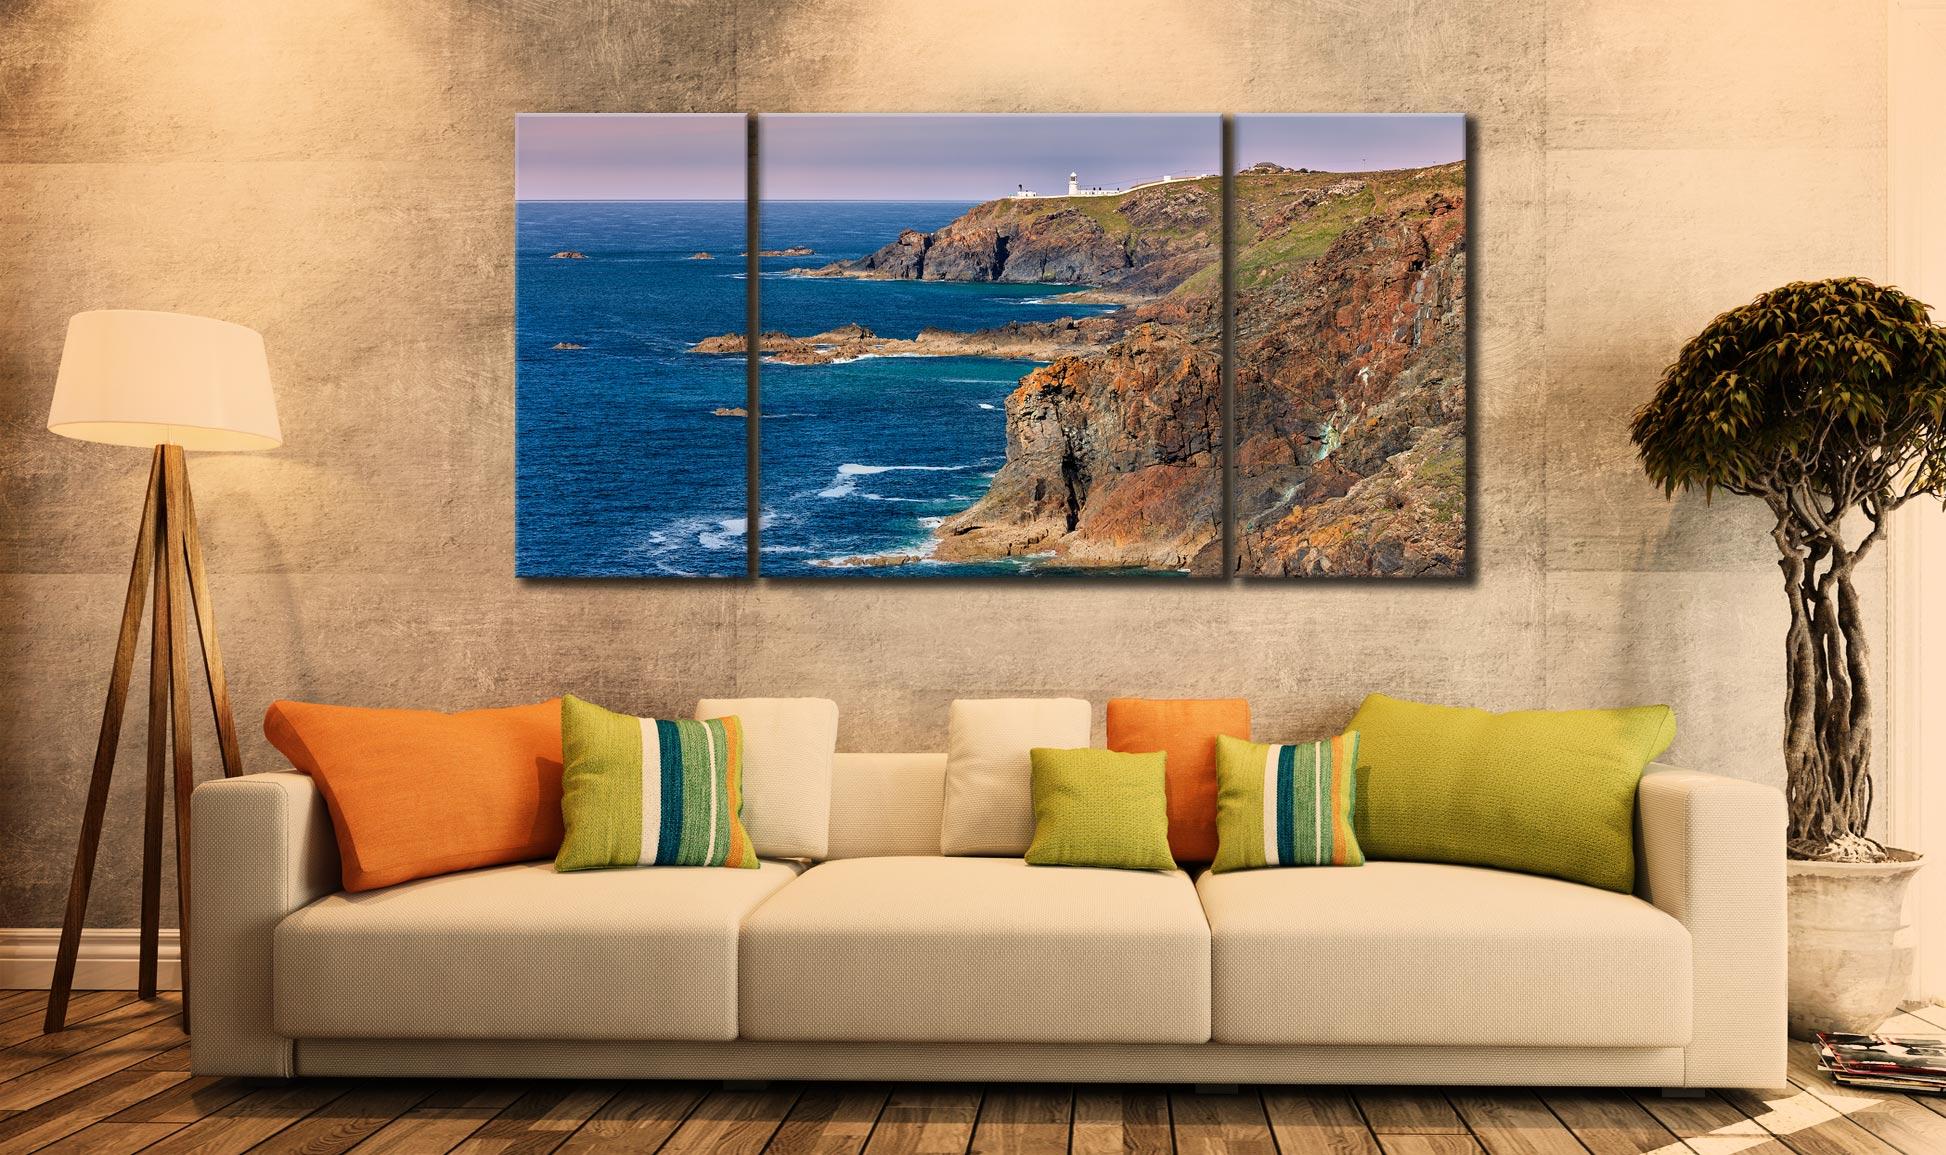 Pendeen Lighthouse Cliffs - 3 Panel Wide Centre Canvas on Wall